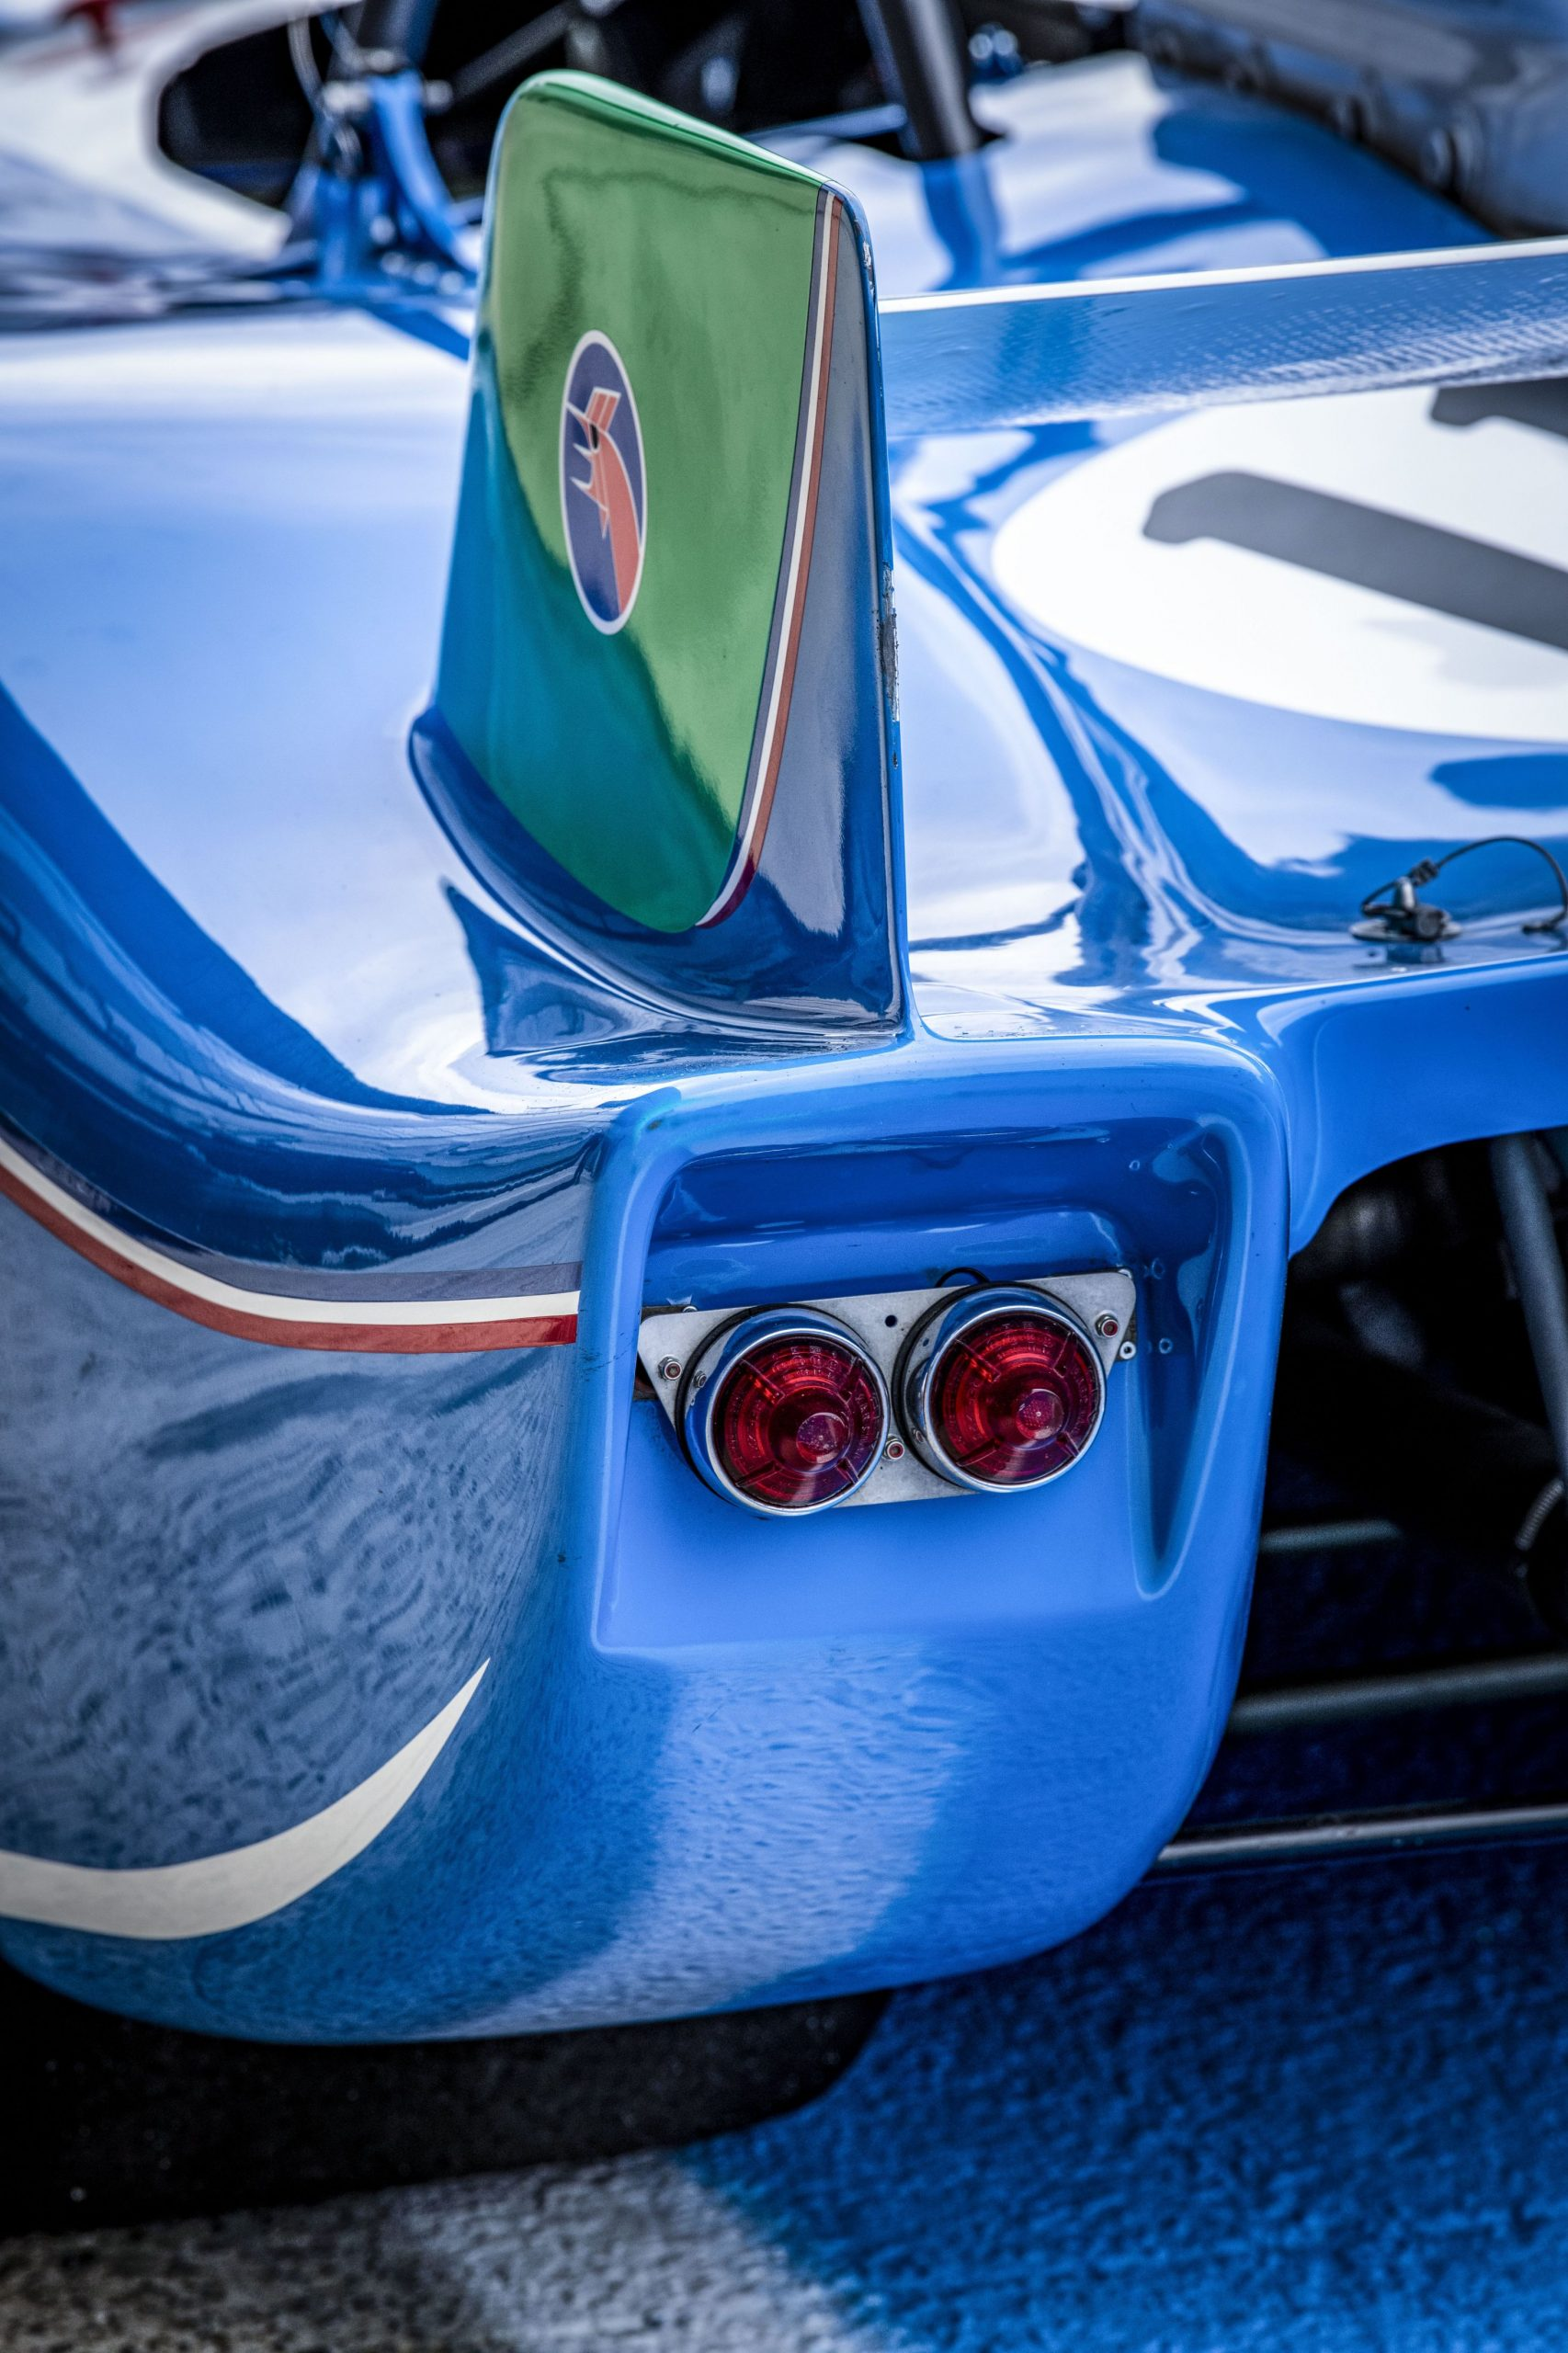 1972 Matra MS 670 rear taillight aerodynamic detail